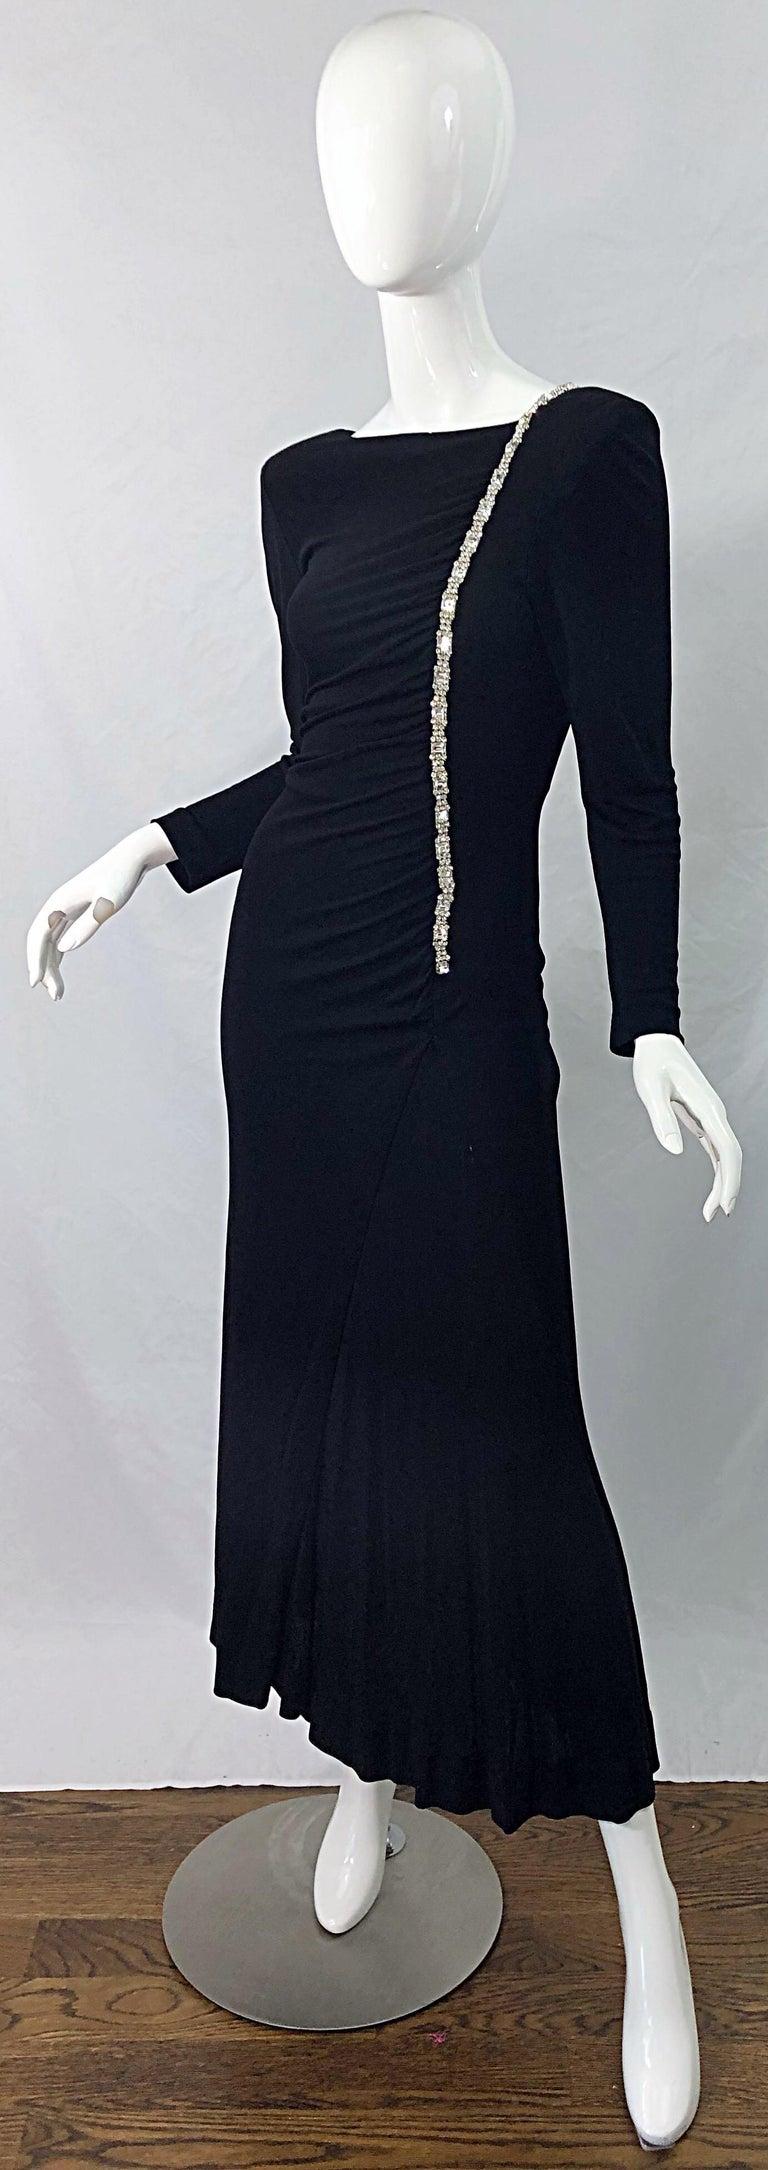 1980s Travilla Size 10 Black Matte Silk Jersey Rhinestone Vintage 80s Gown Dress For Sale 1